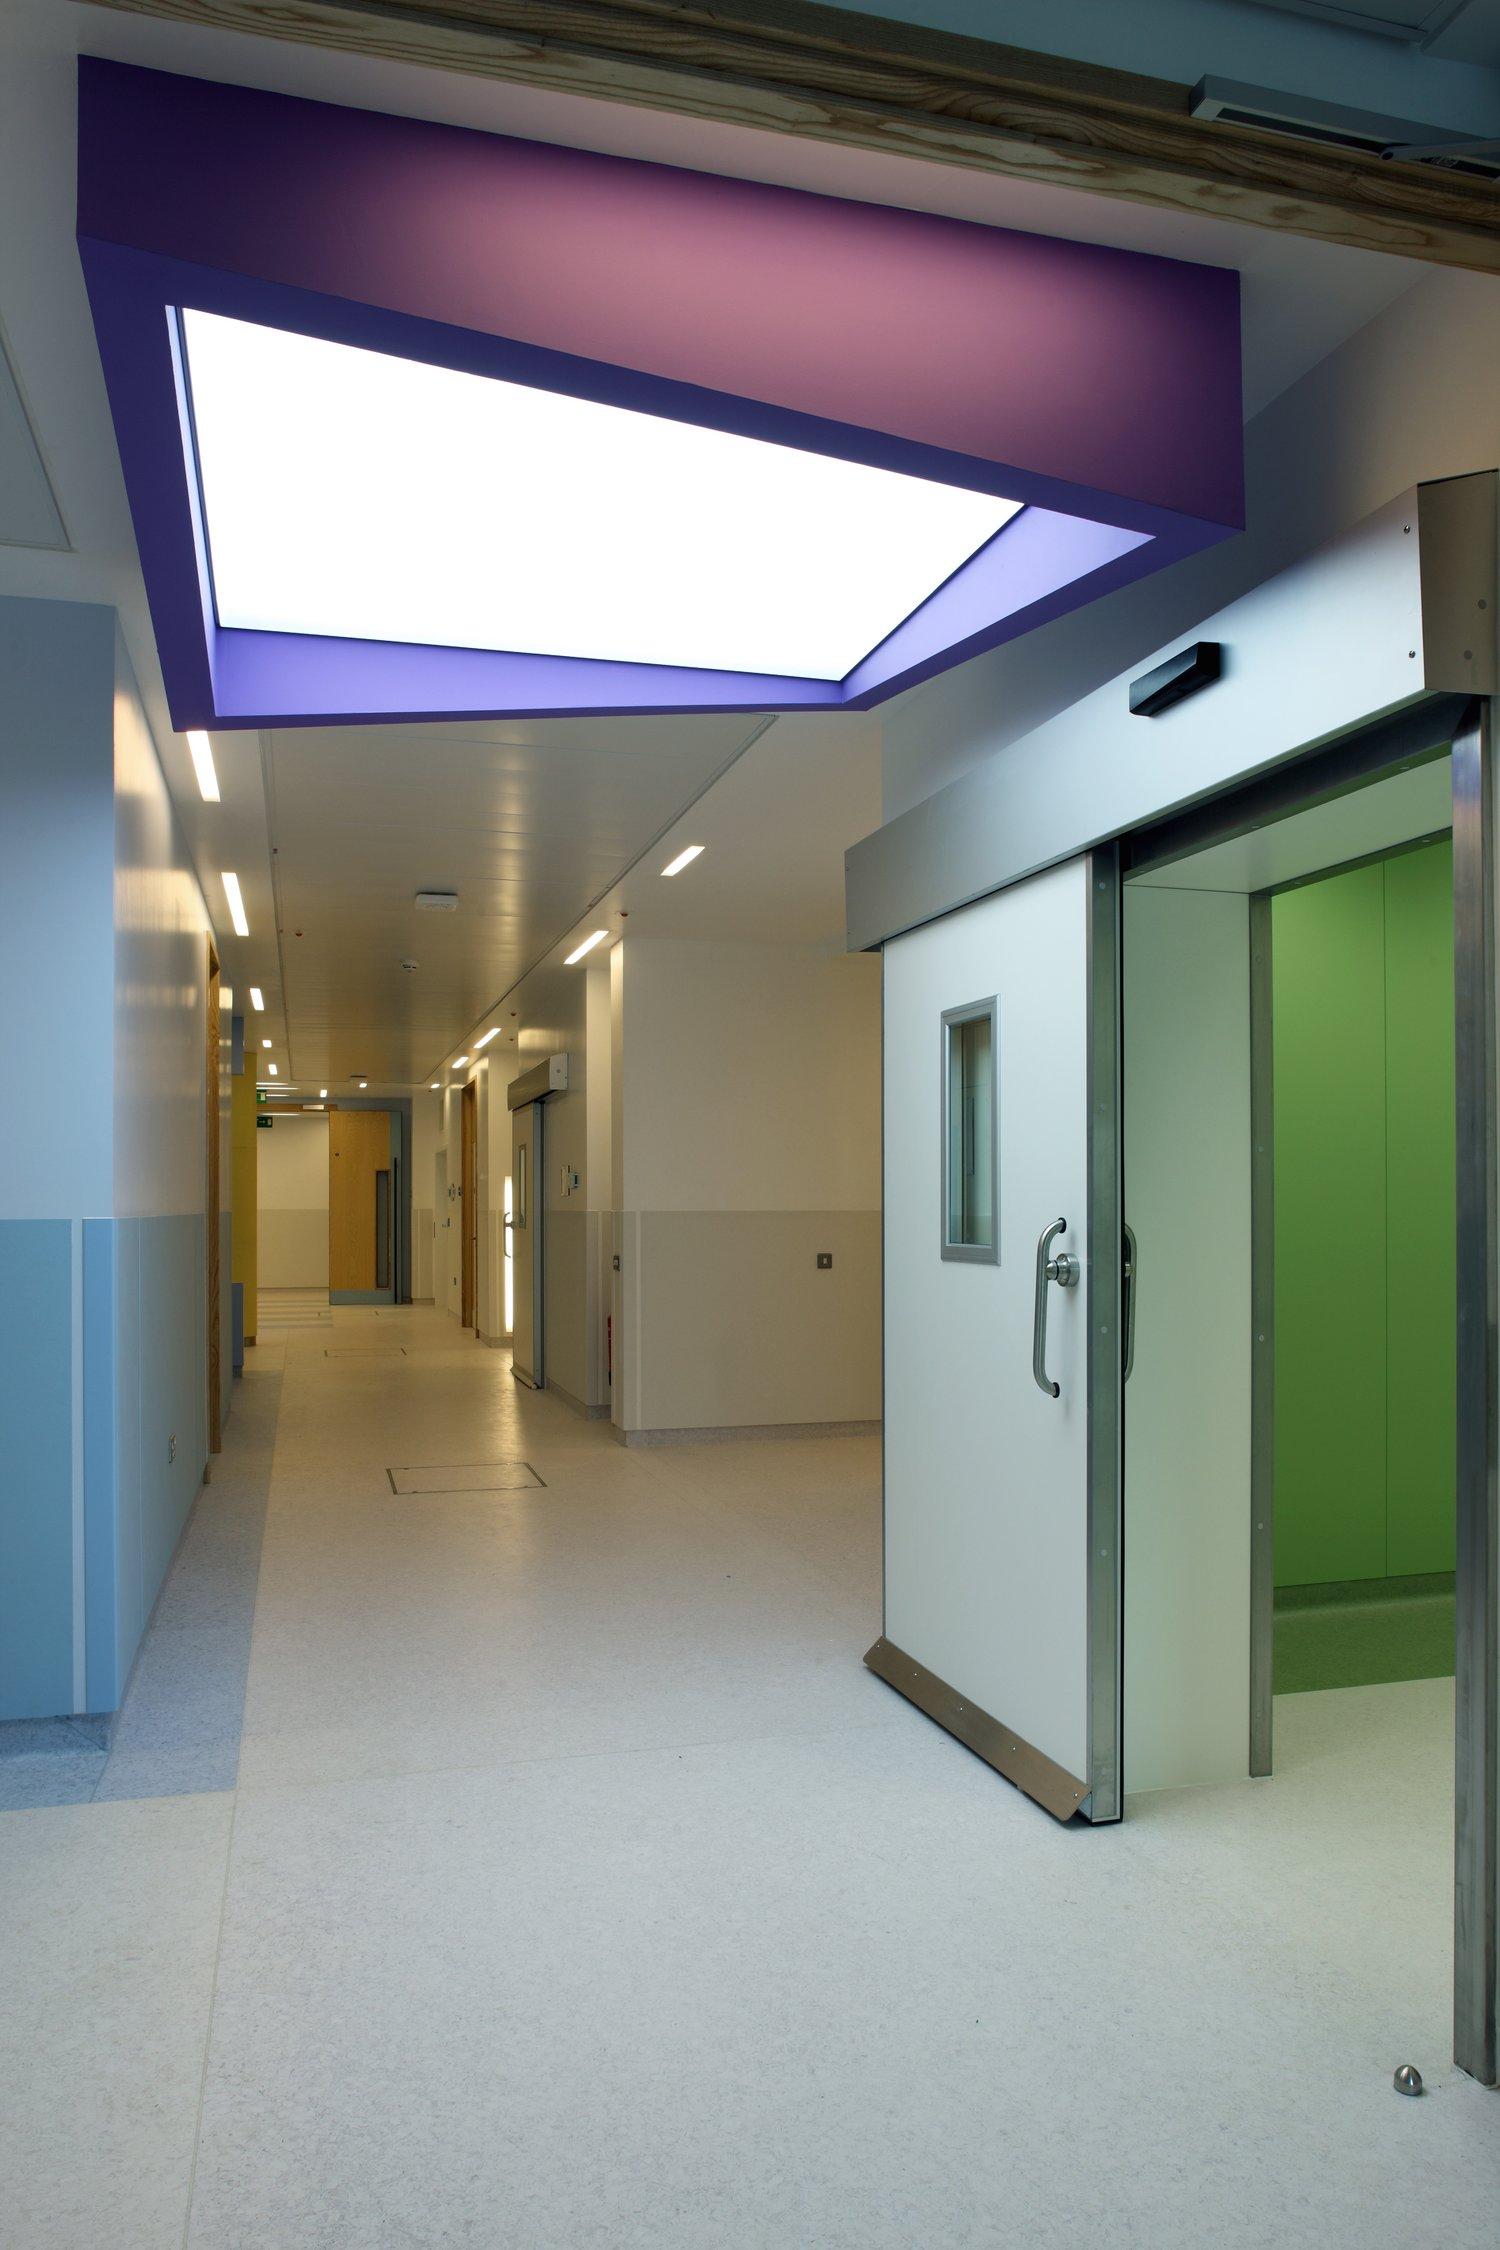 Hospital translucent stretch fabric